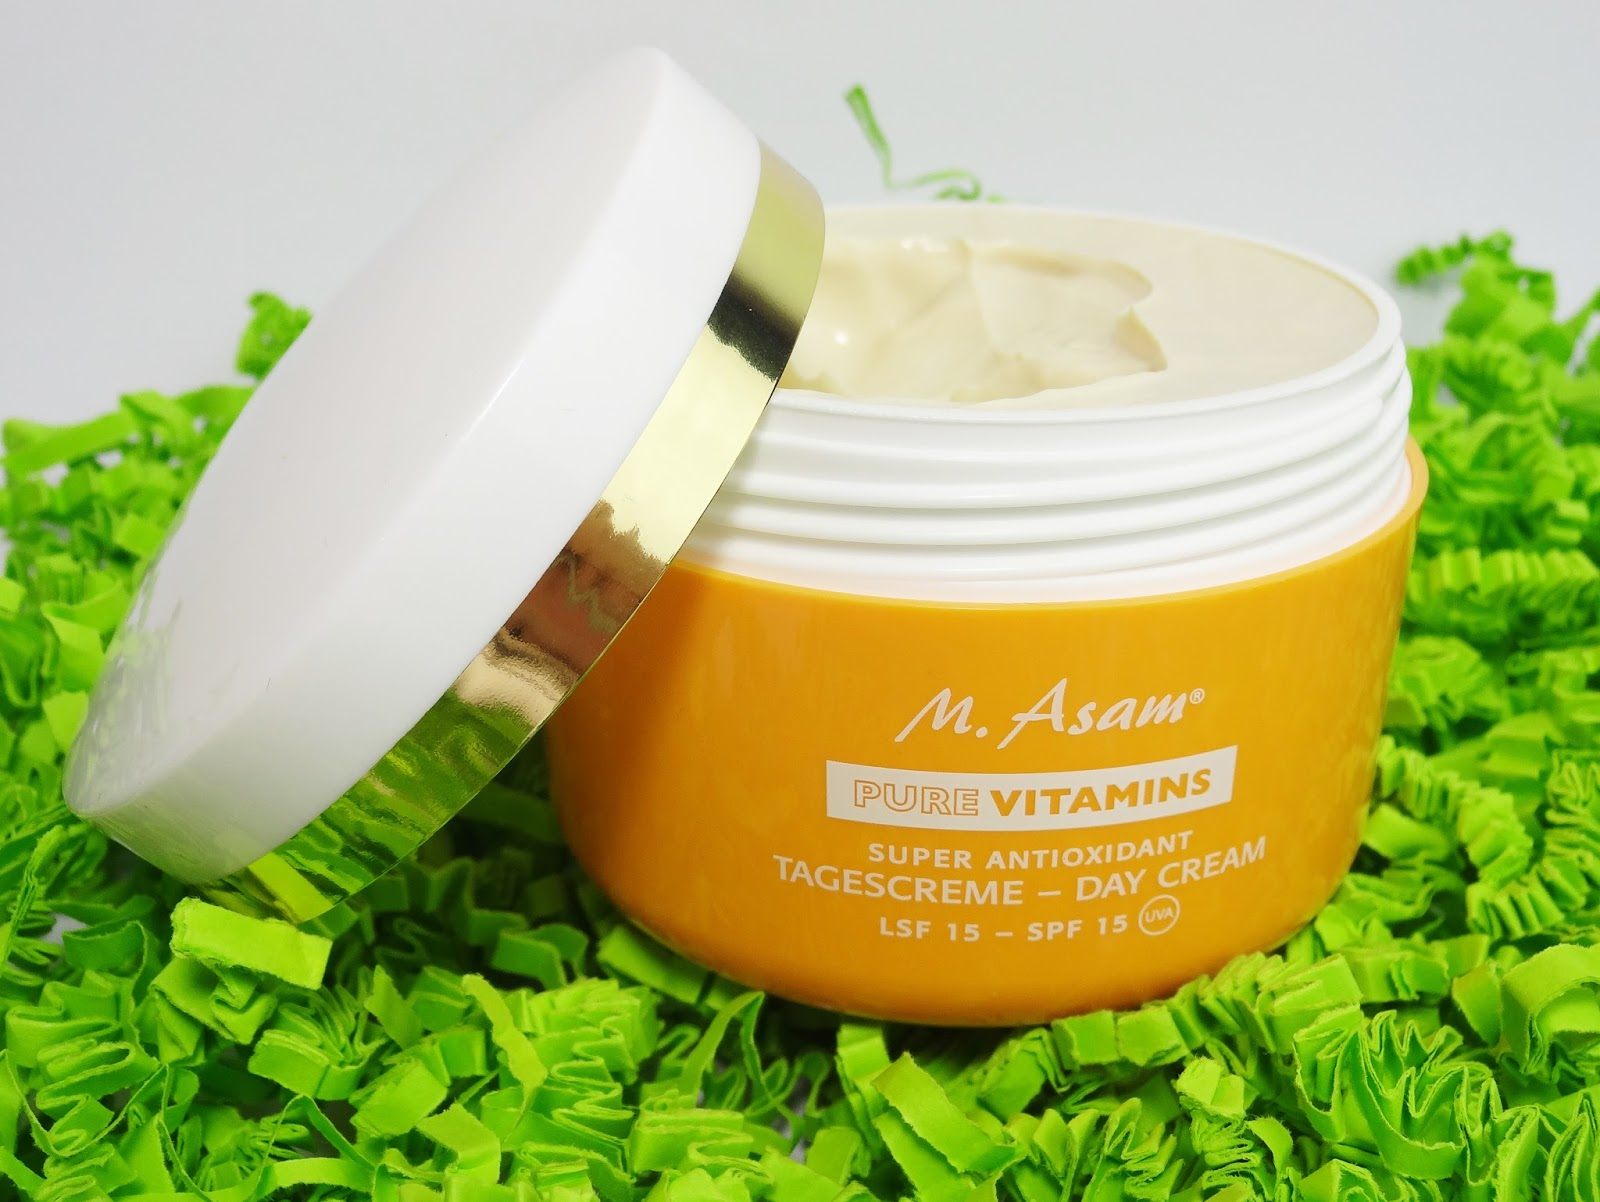 M. Asam - Pure Vitamins Super Antioxidant Tagescreme Pretty Clover Beautyblog